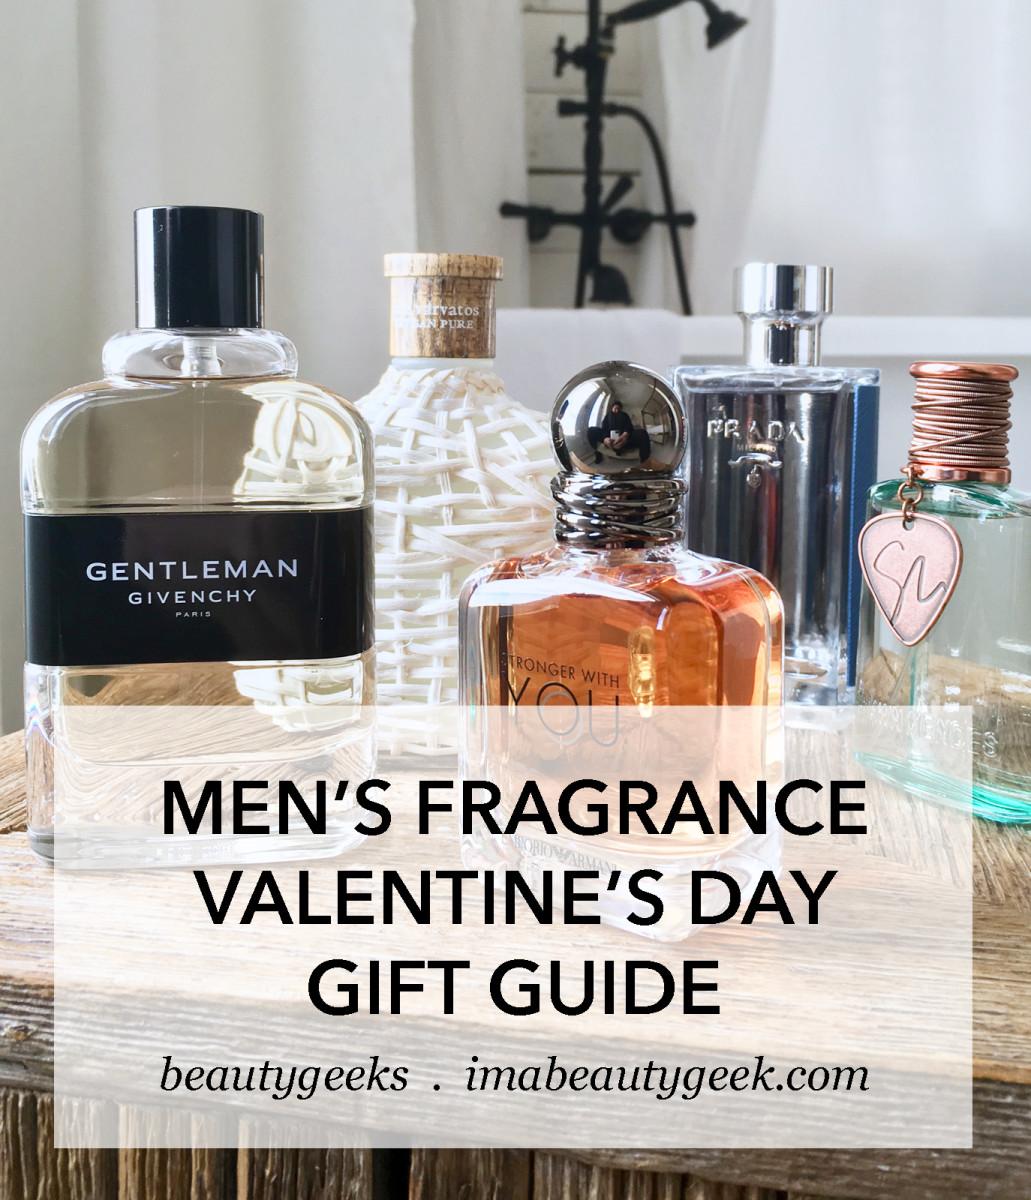 Men's fragrance for Valentine's Day 2018-Craig Macinnis-BEAUTYGEEKS